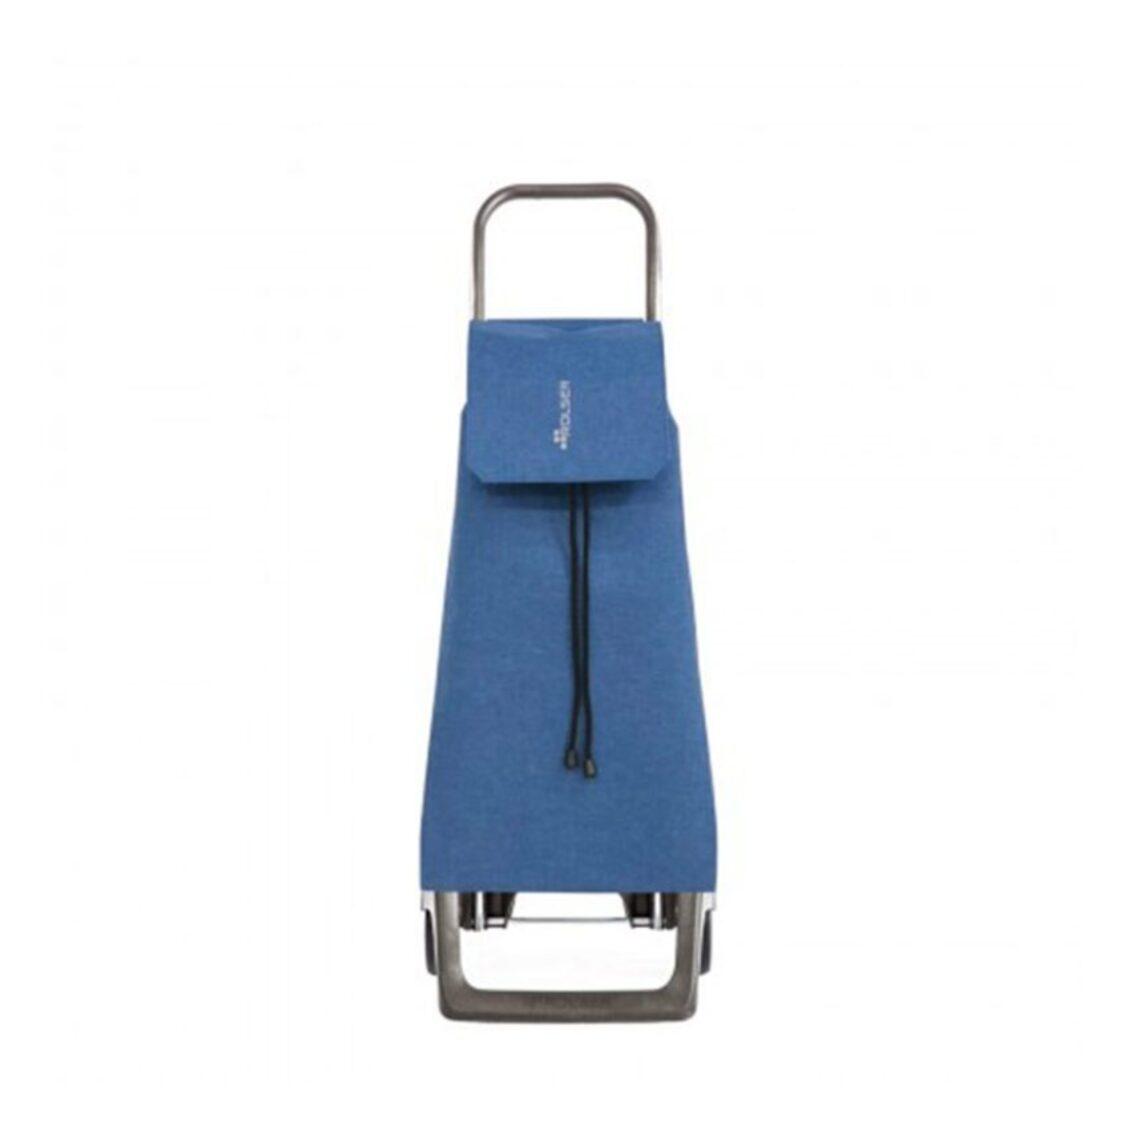 Rolser Jet-038 Shopping Trolley Blue J65748